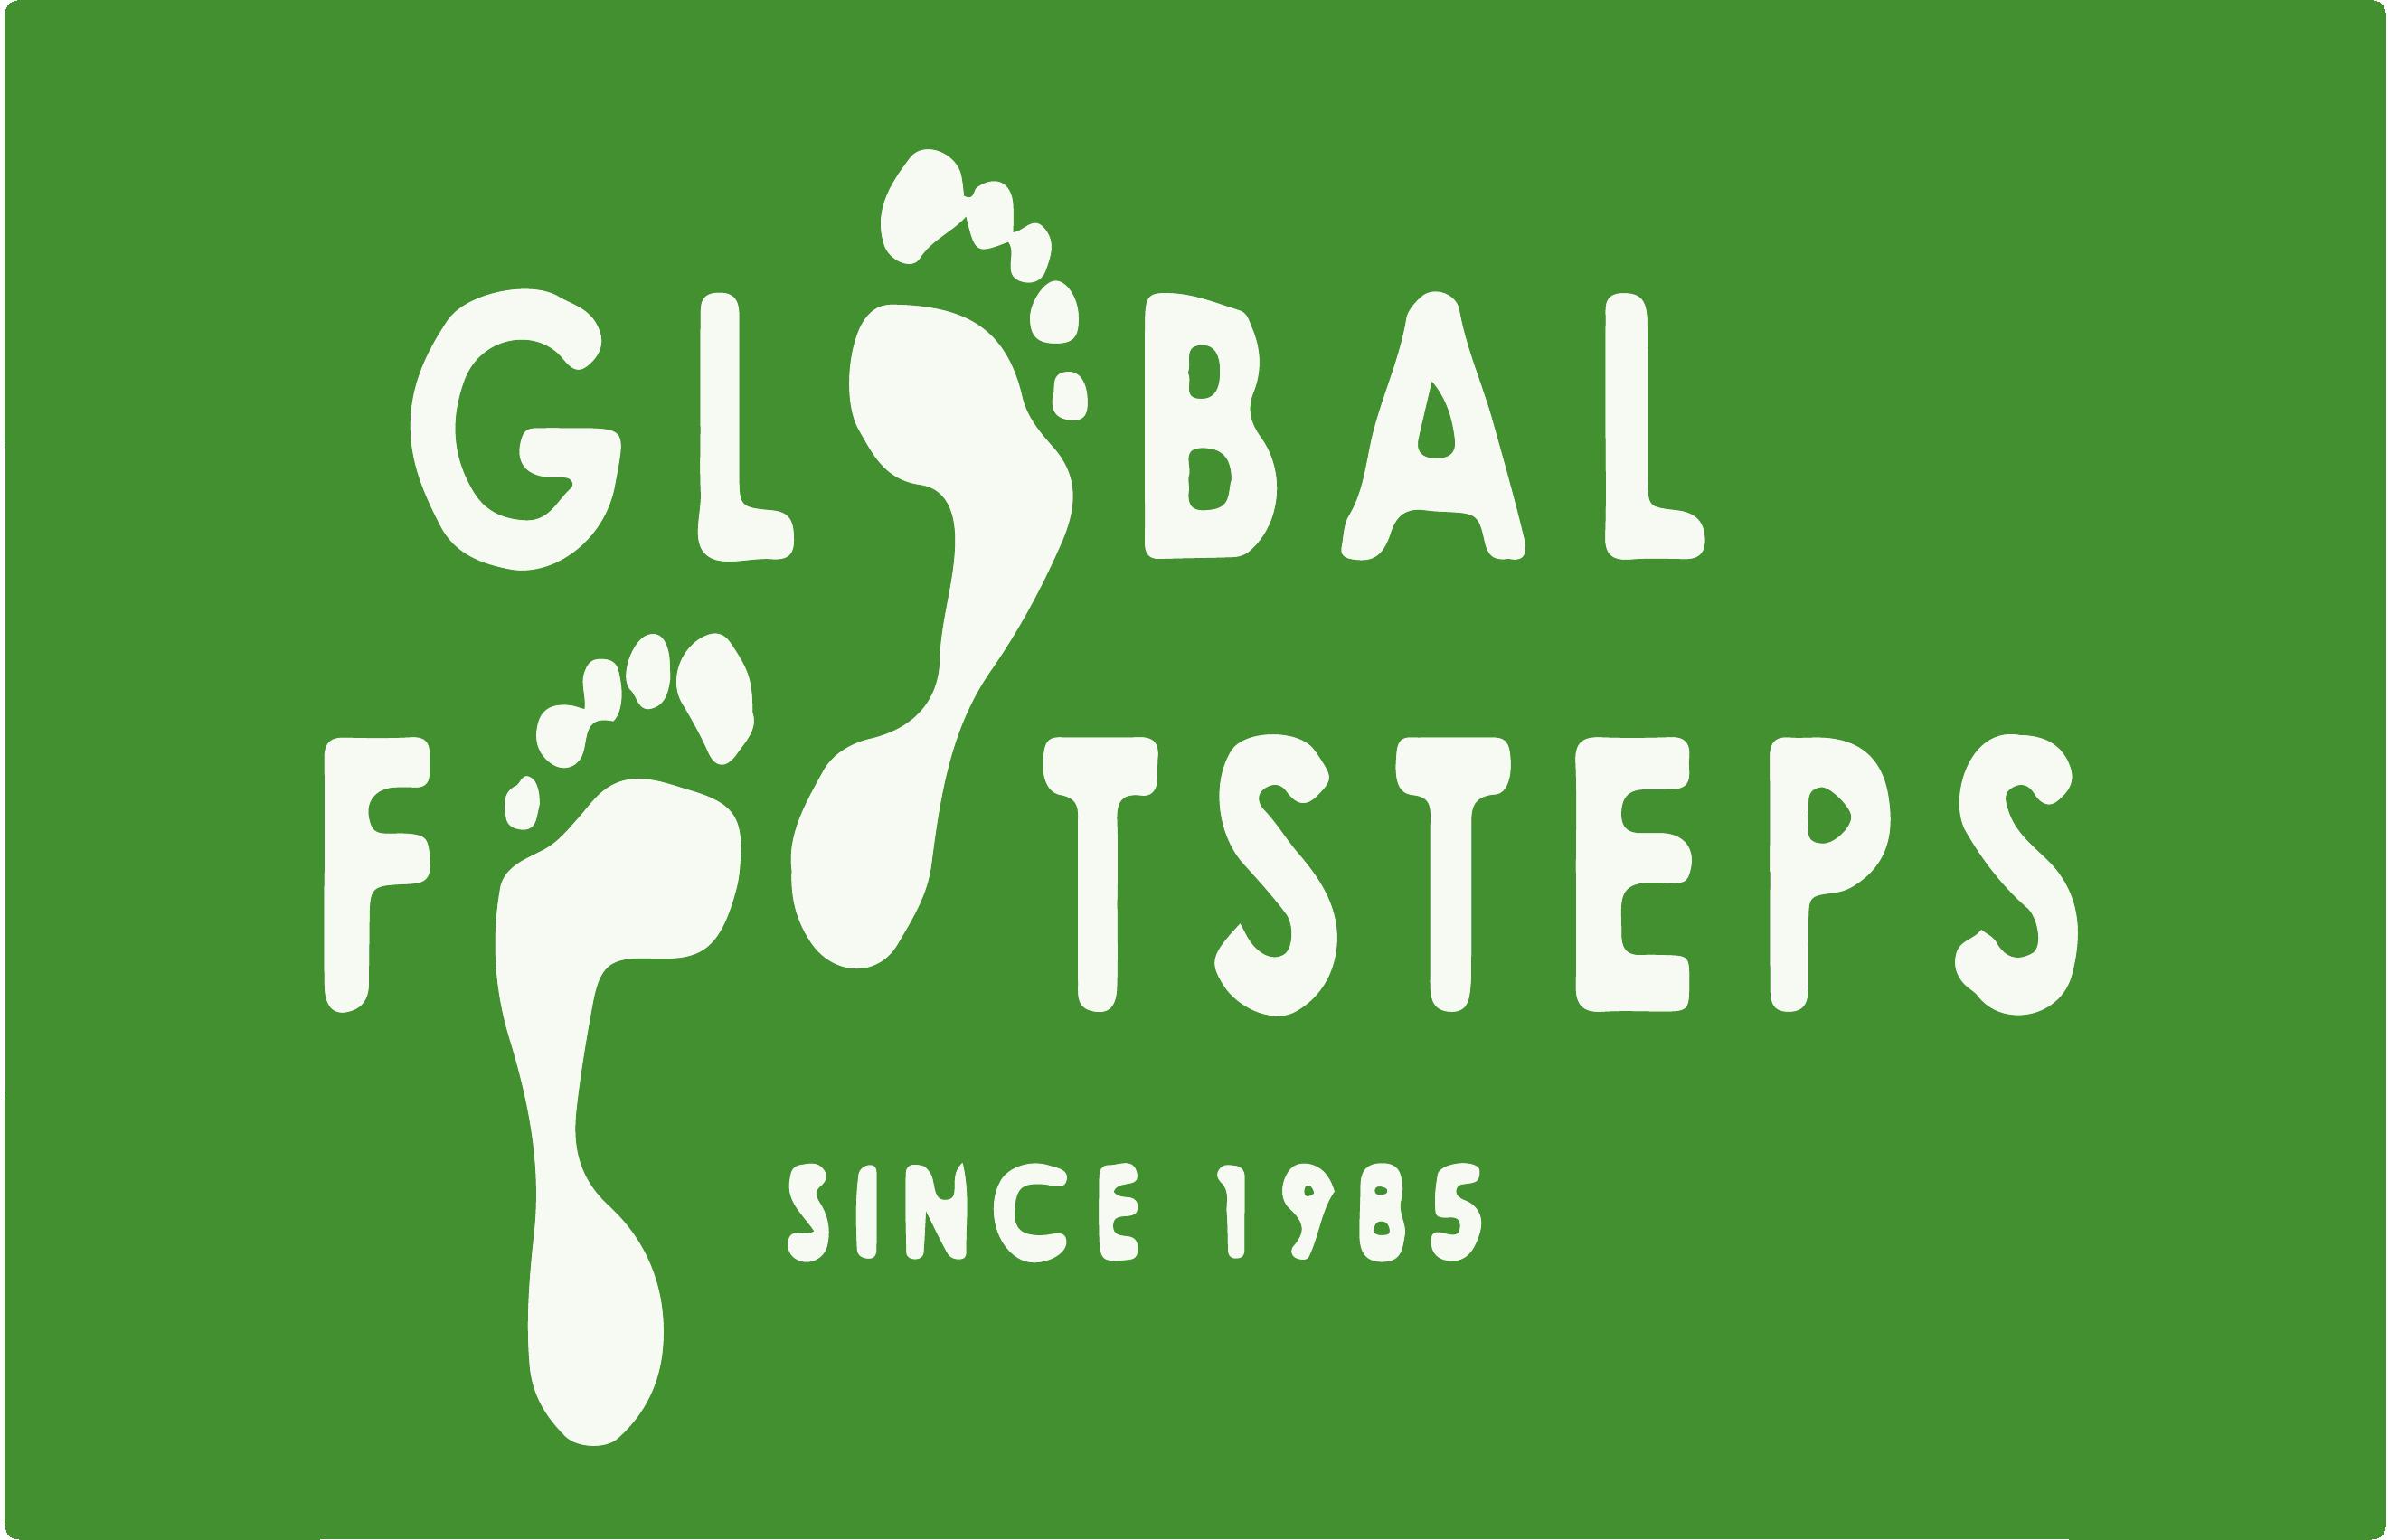 global footsteps